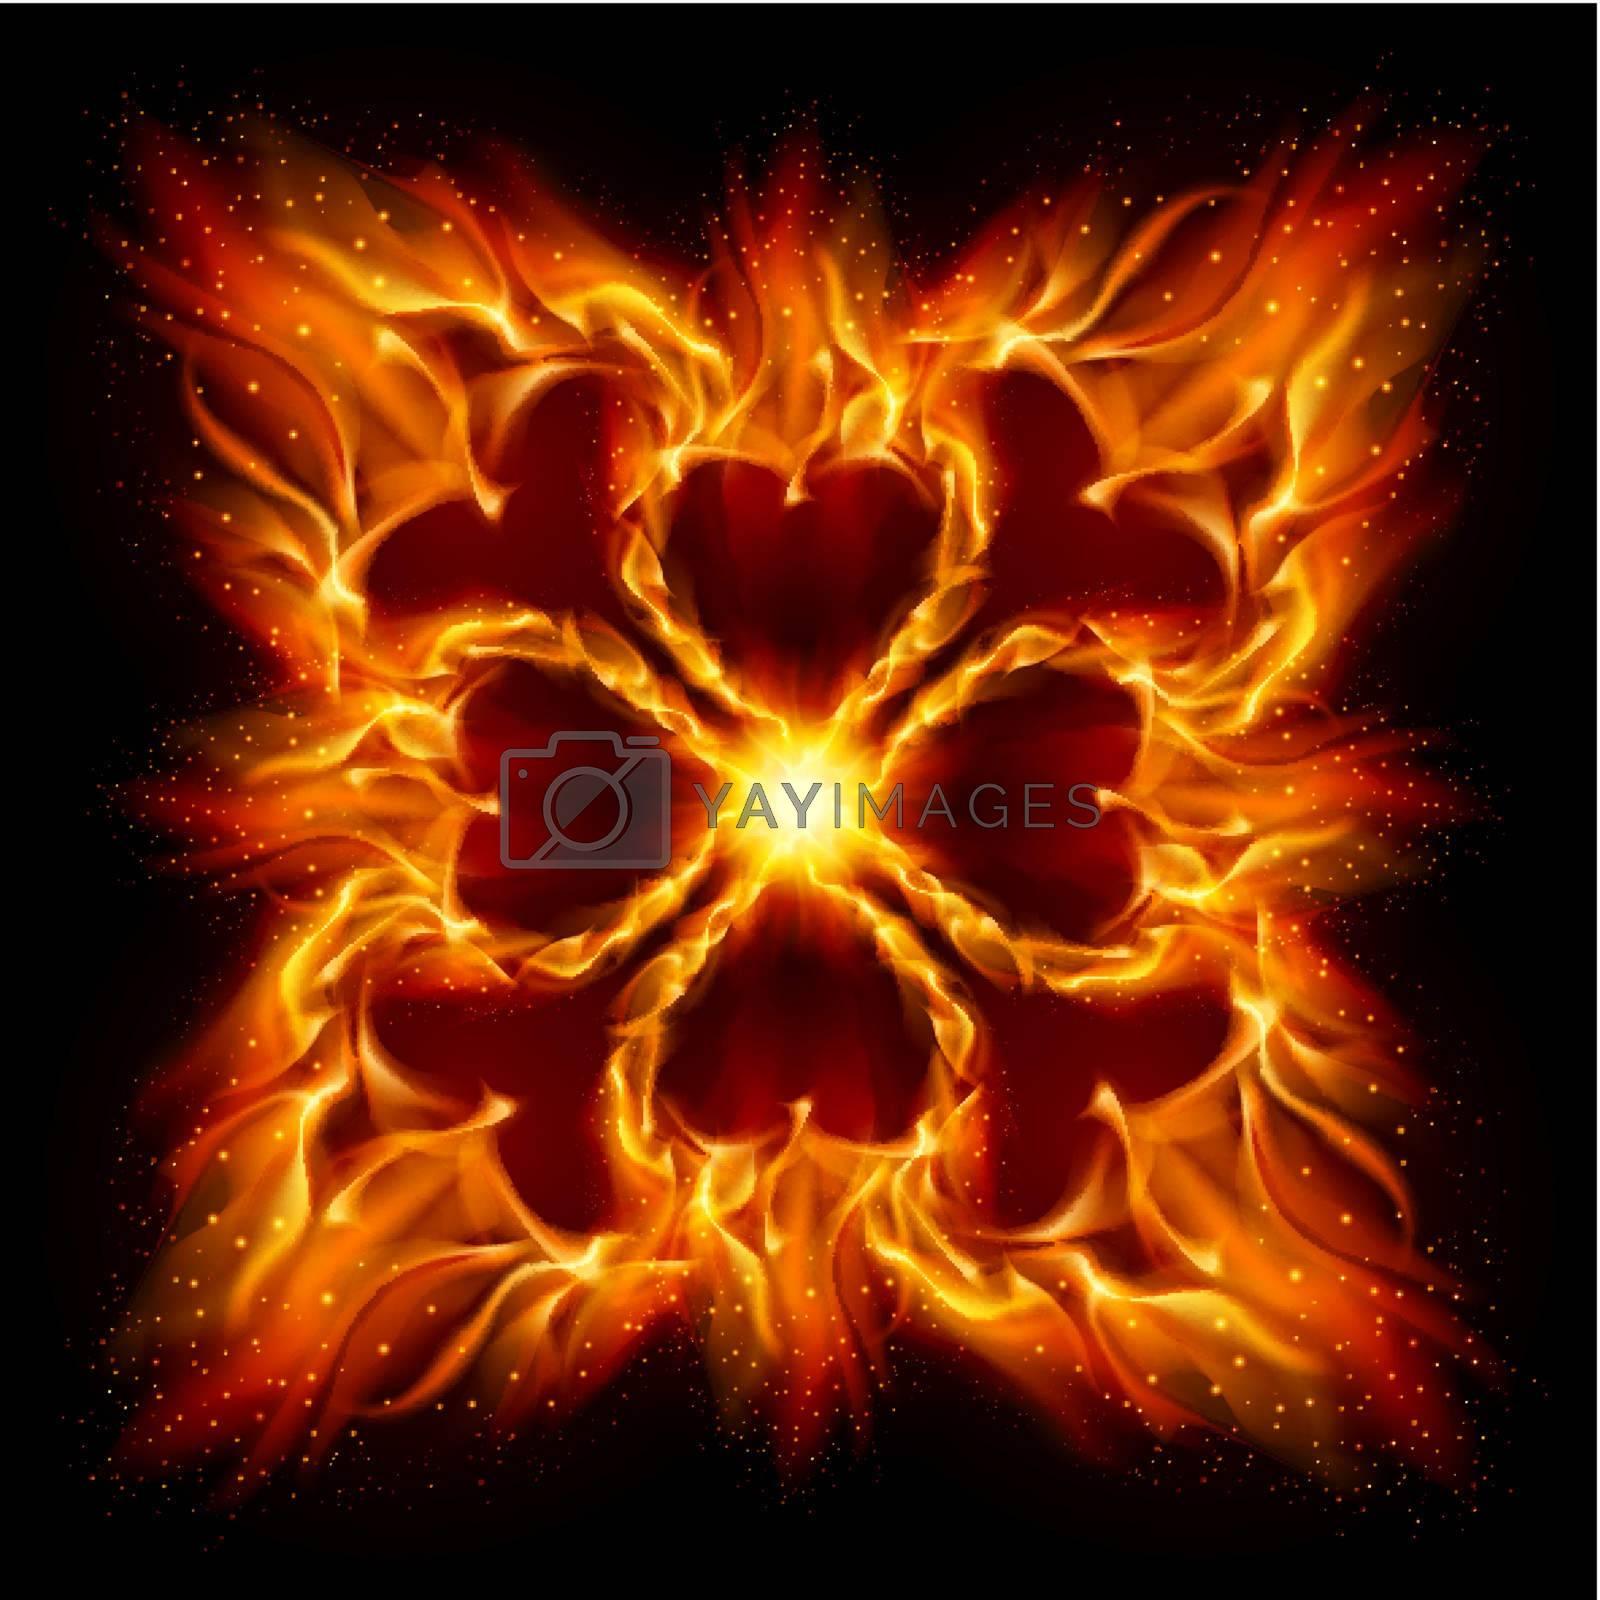 Burning fire crossСЋ Illustration on black background for design